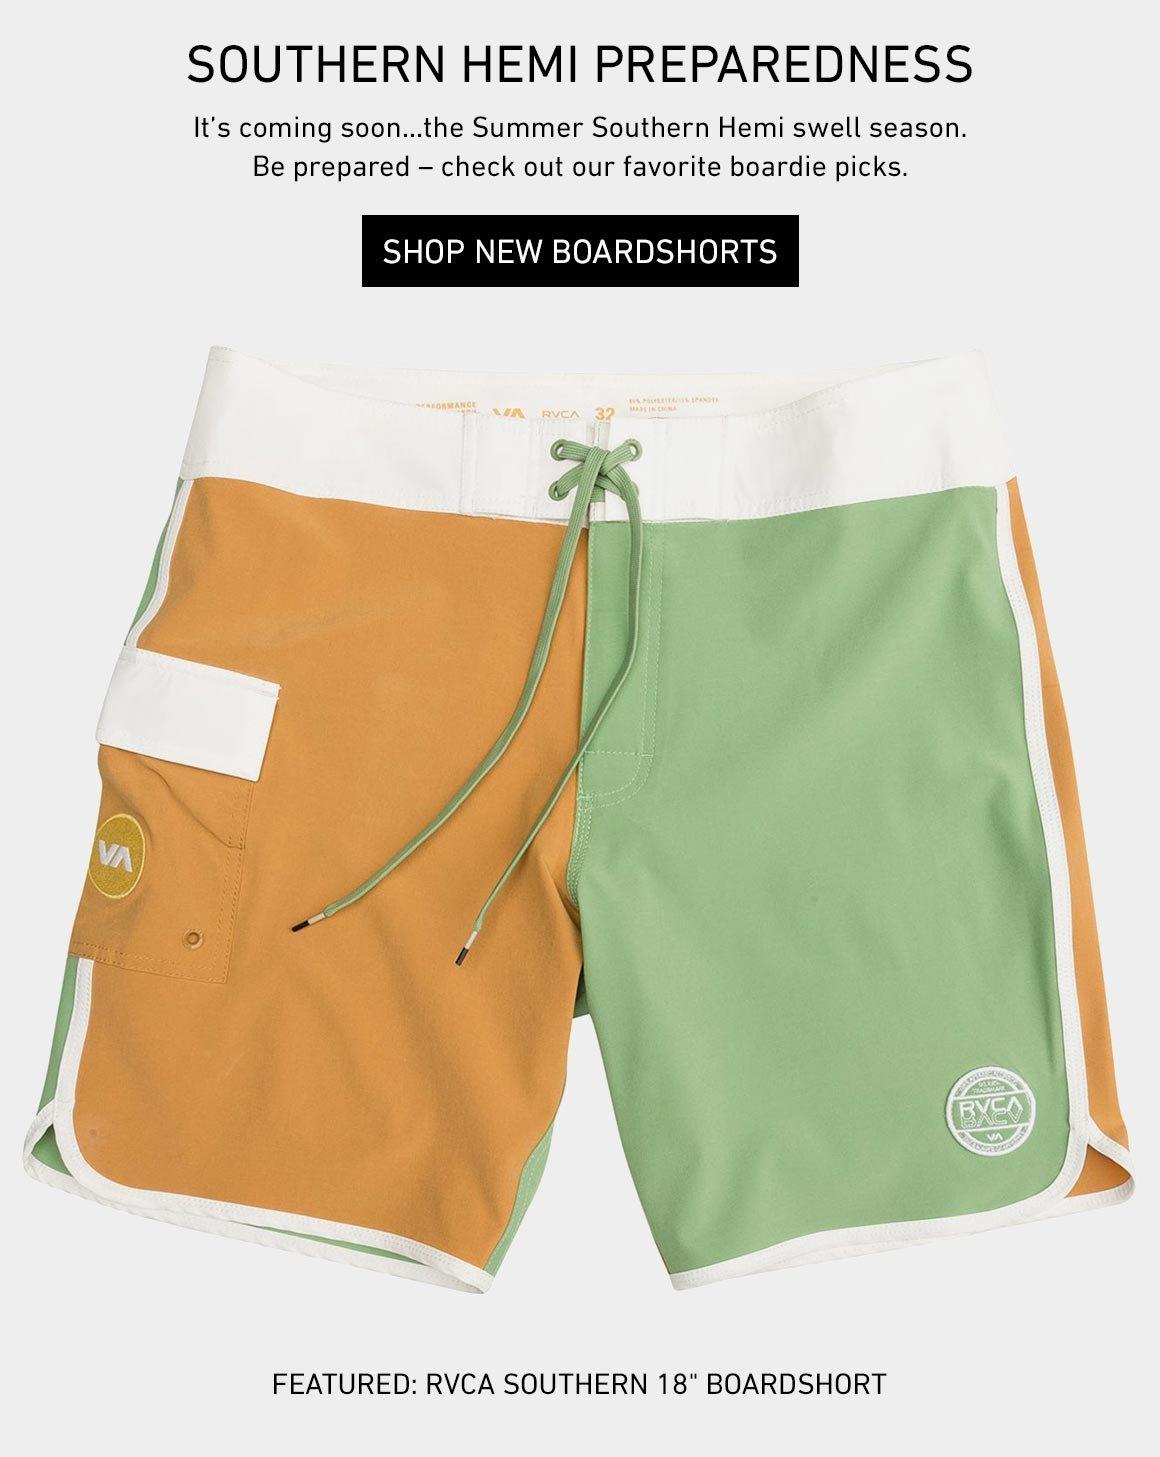 New Summer Boardshorts